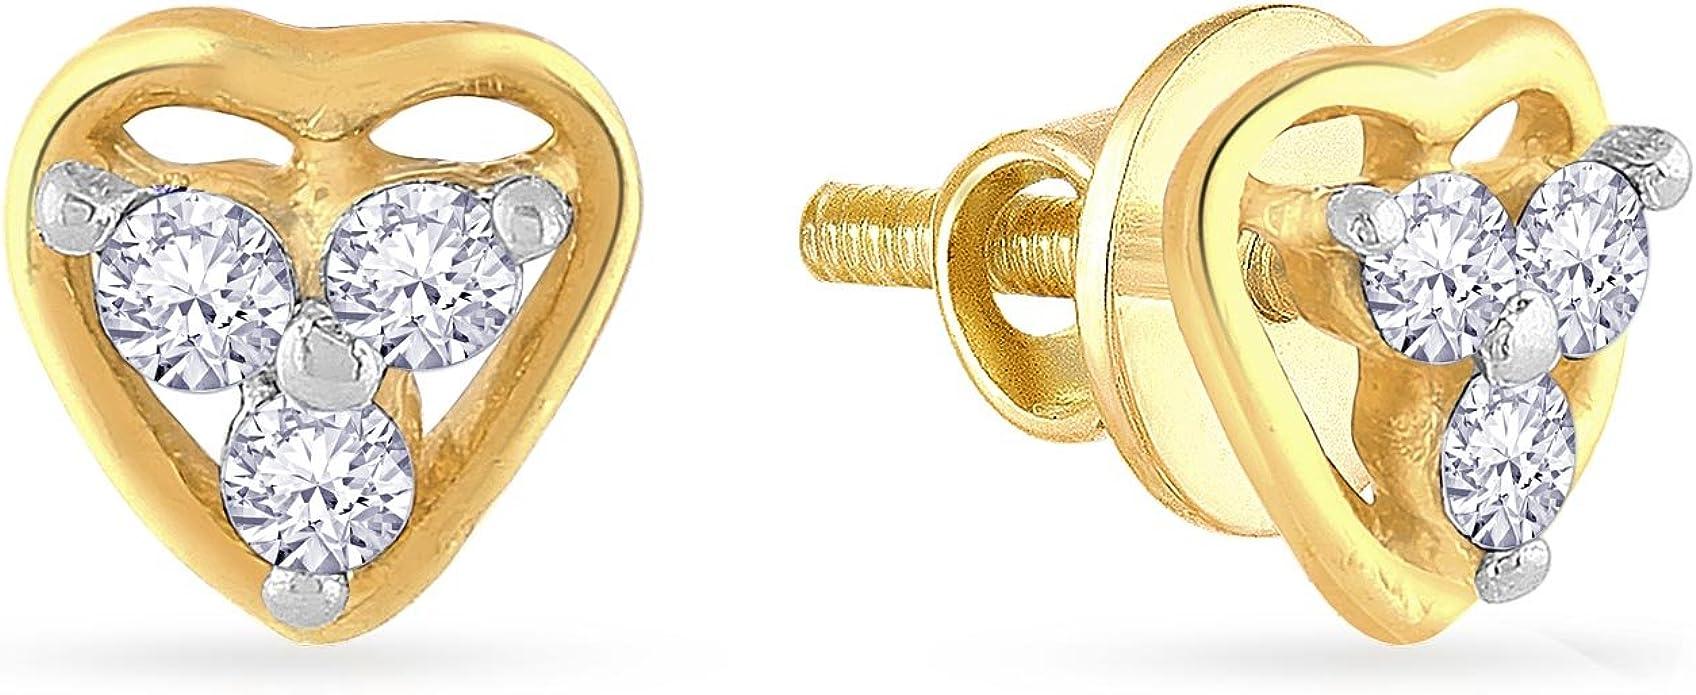 Malabar Gold  amp; Diamonds 18KT Yellow Gold and Diamond Stud Earrings for Women Earrings